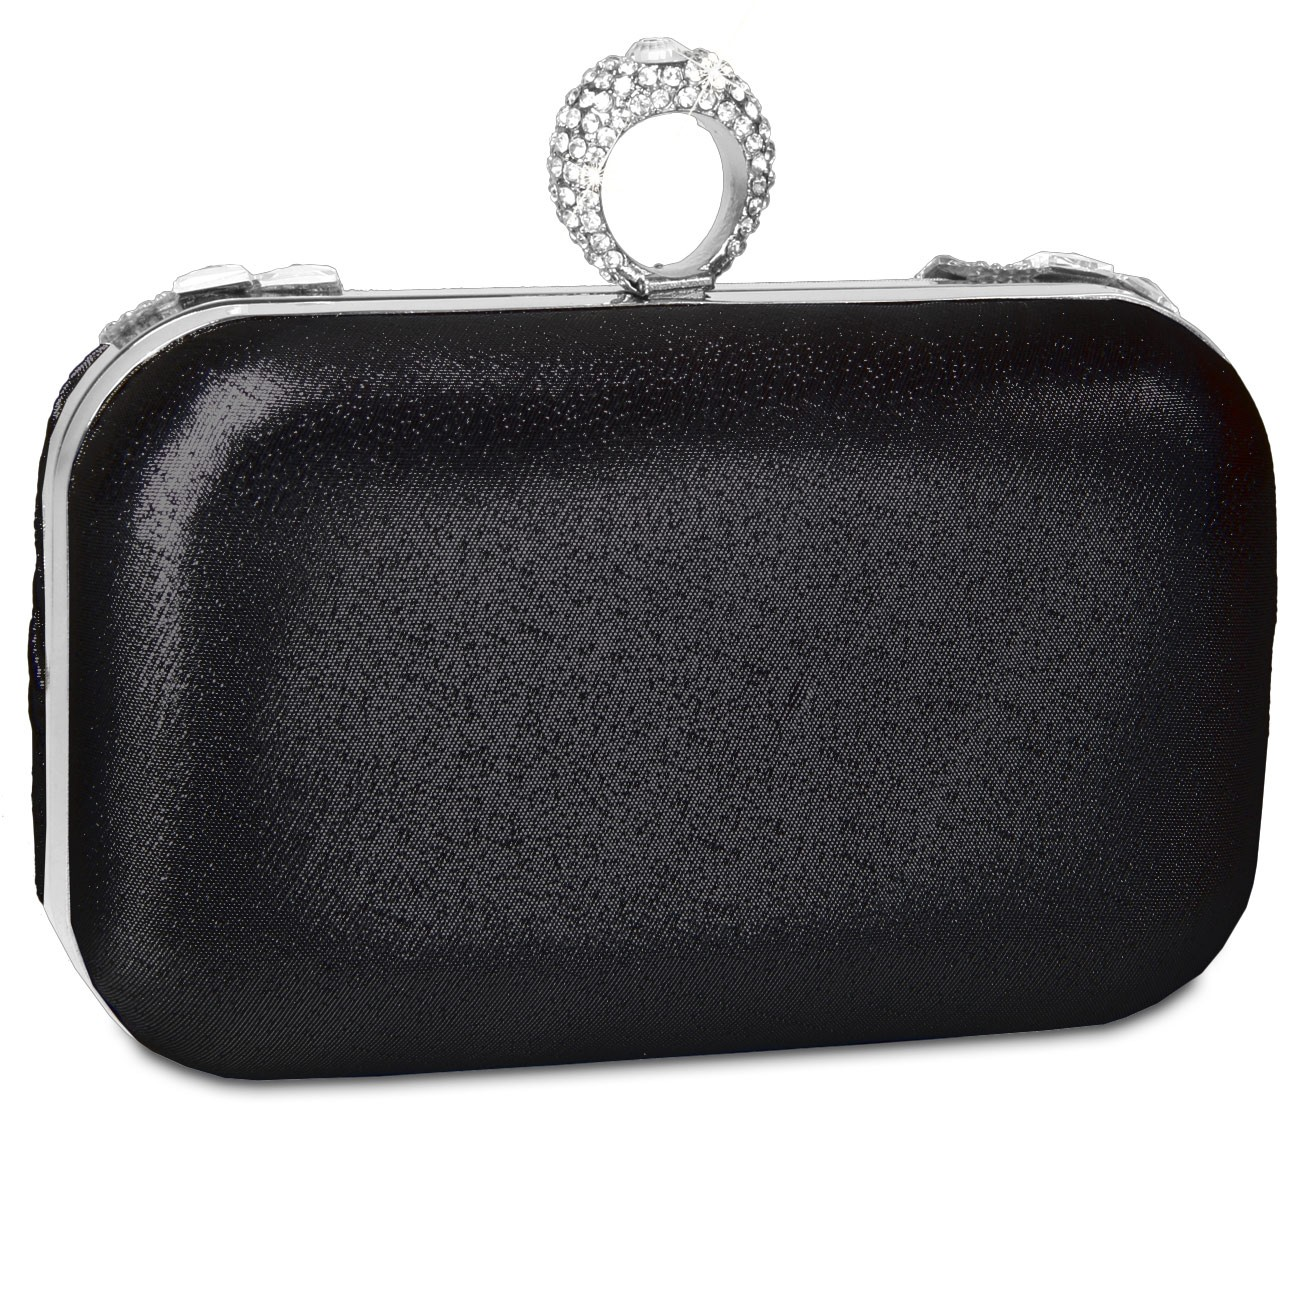 caspar damen elegante box clutch abendtasche mit. Black Bedroom Furniture Sets. Home Design Ideas